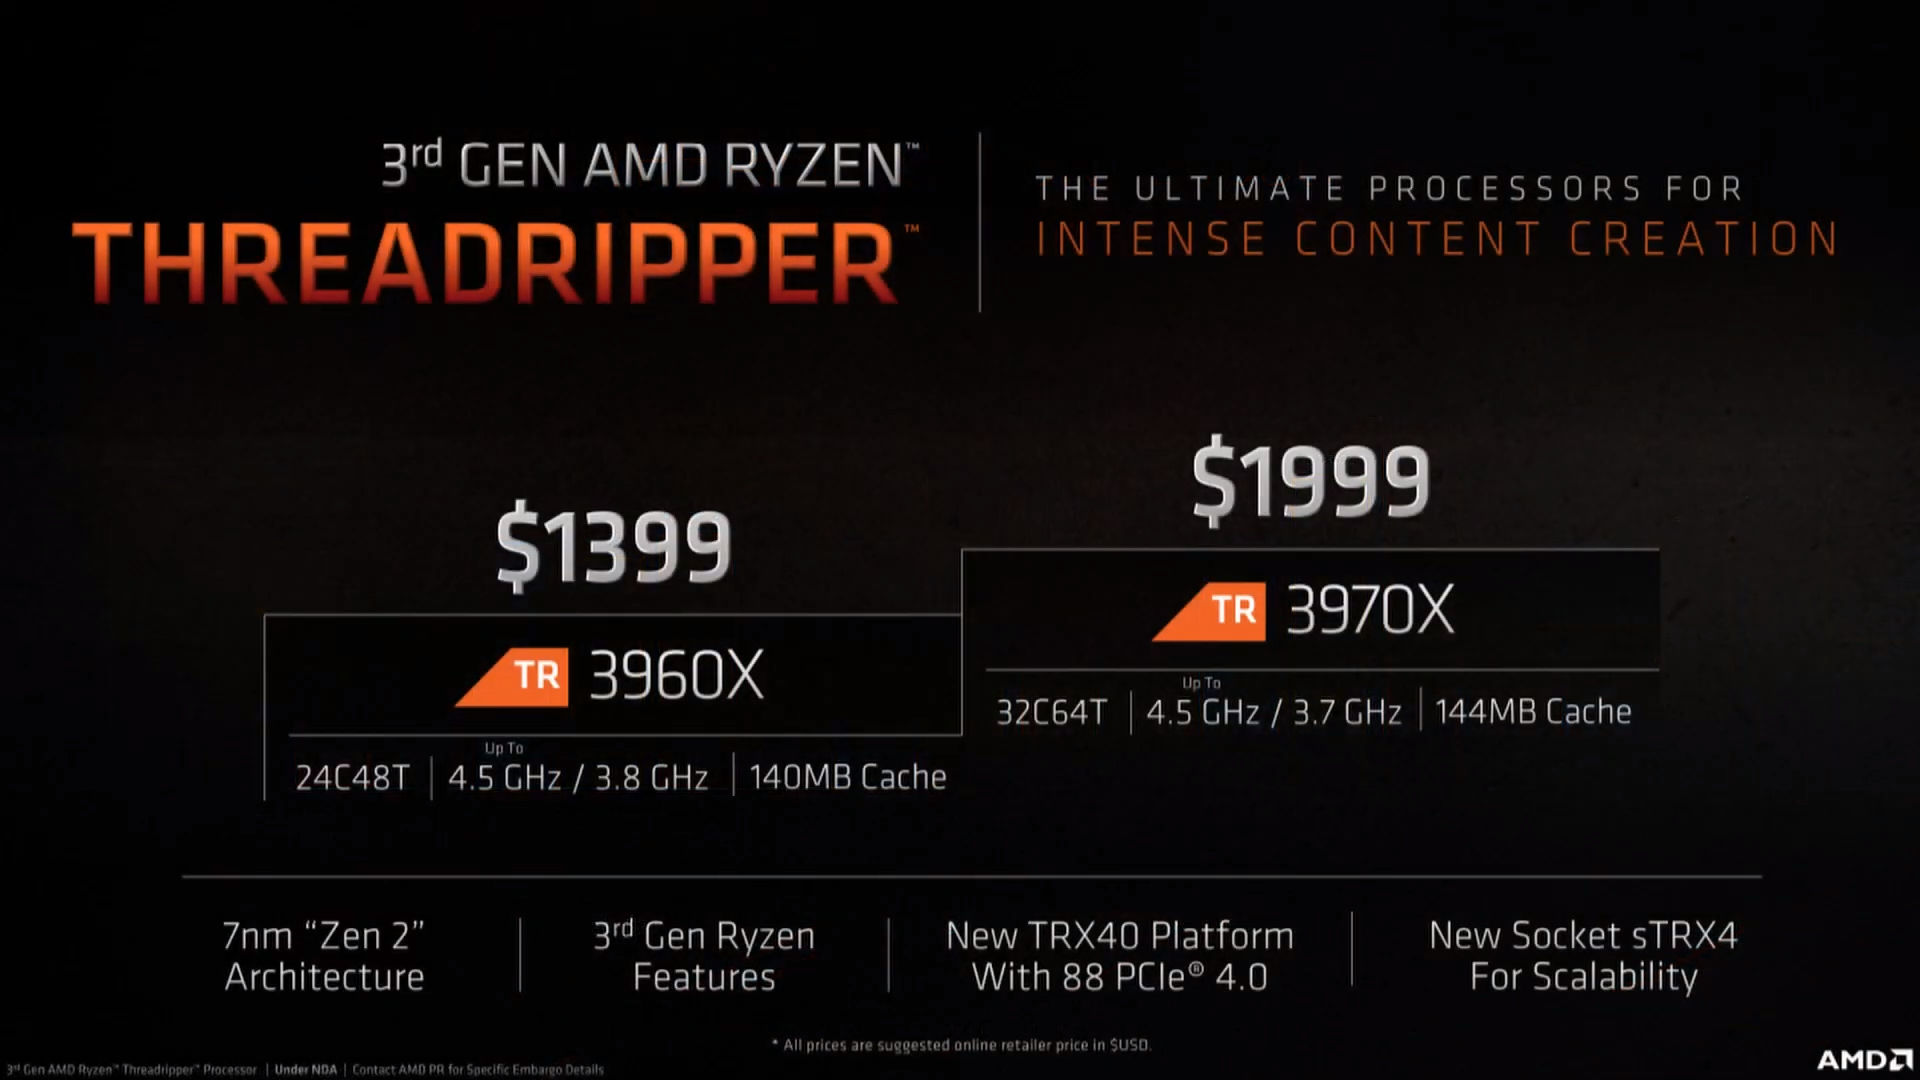 Threadripper 3960X and 3970X Price Specs